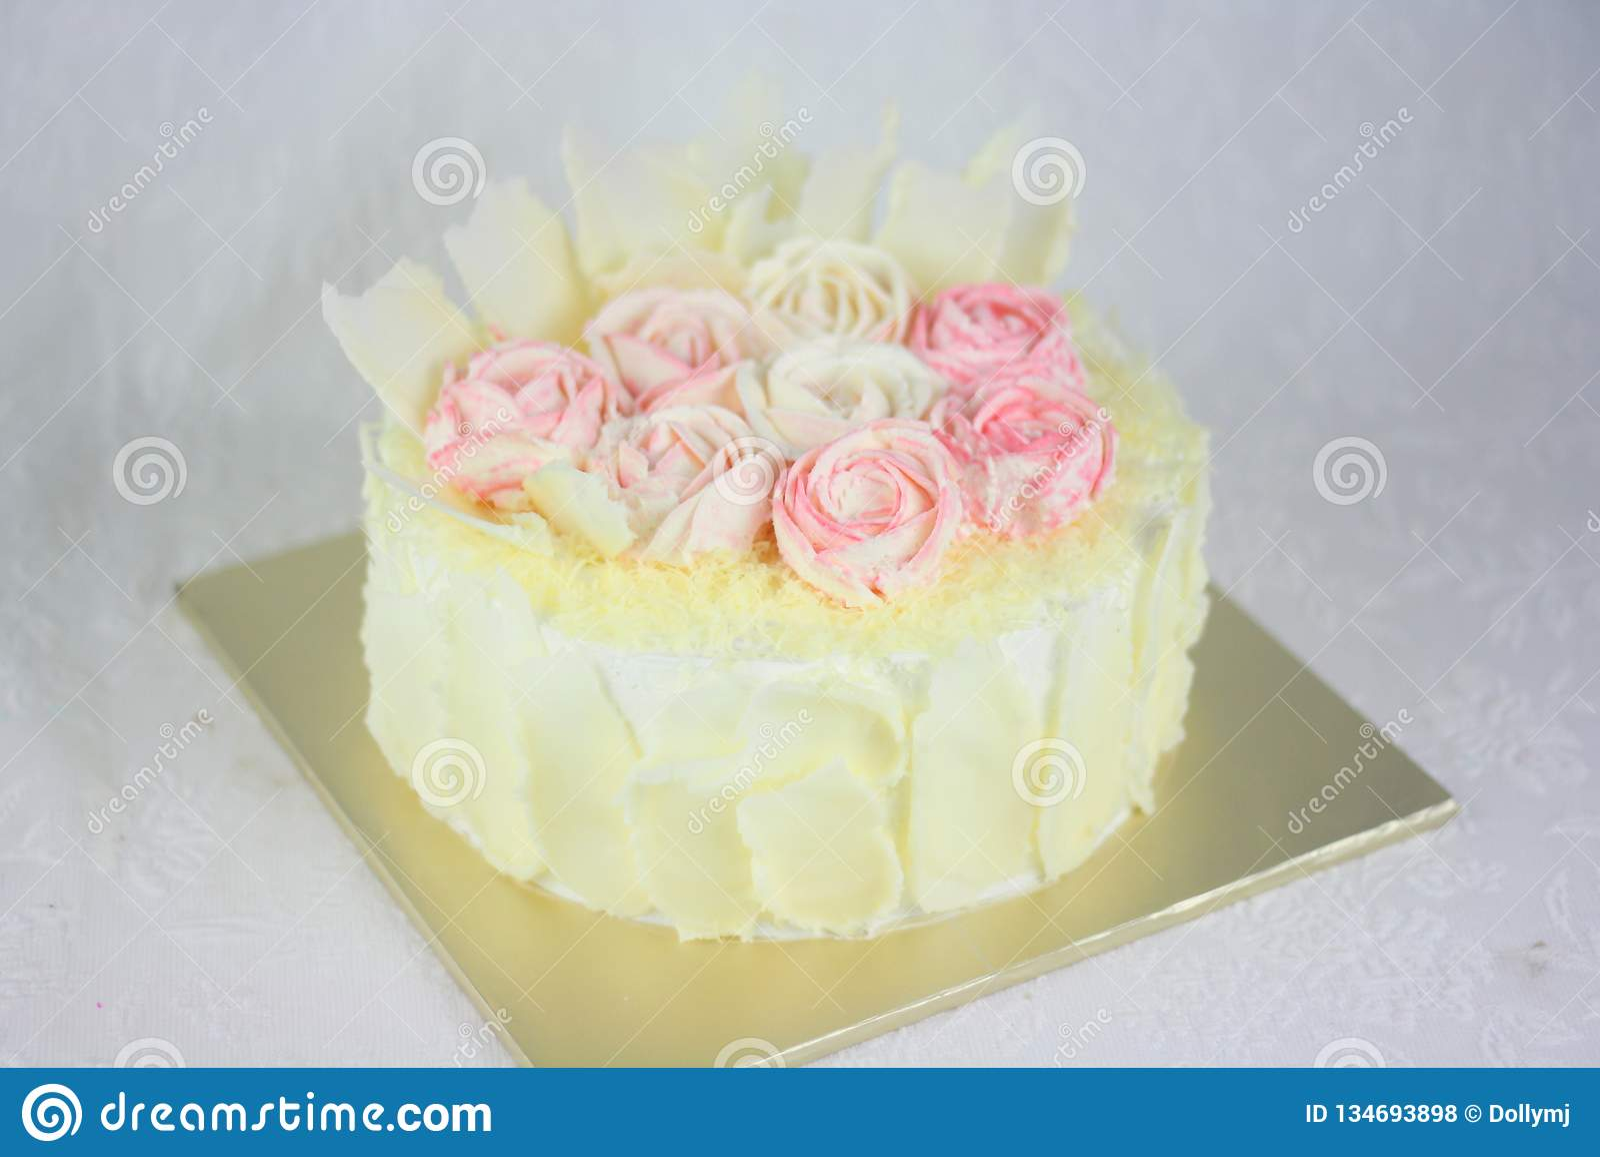 Buttercream Cake Basket And Flower Design Stock Photo Image Of